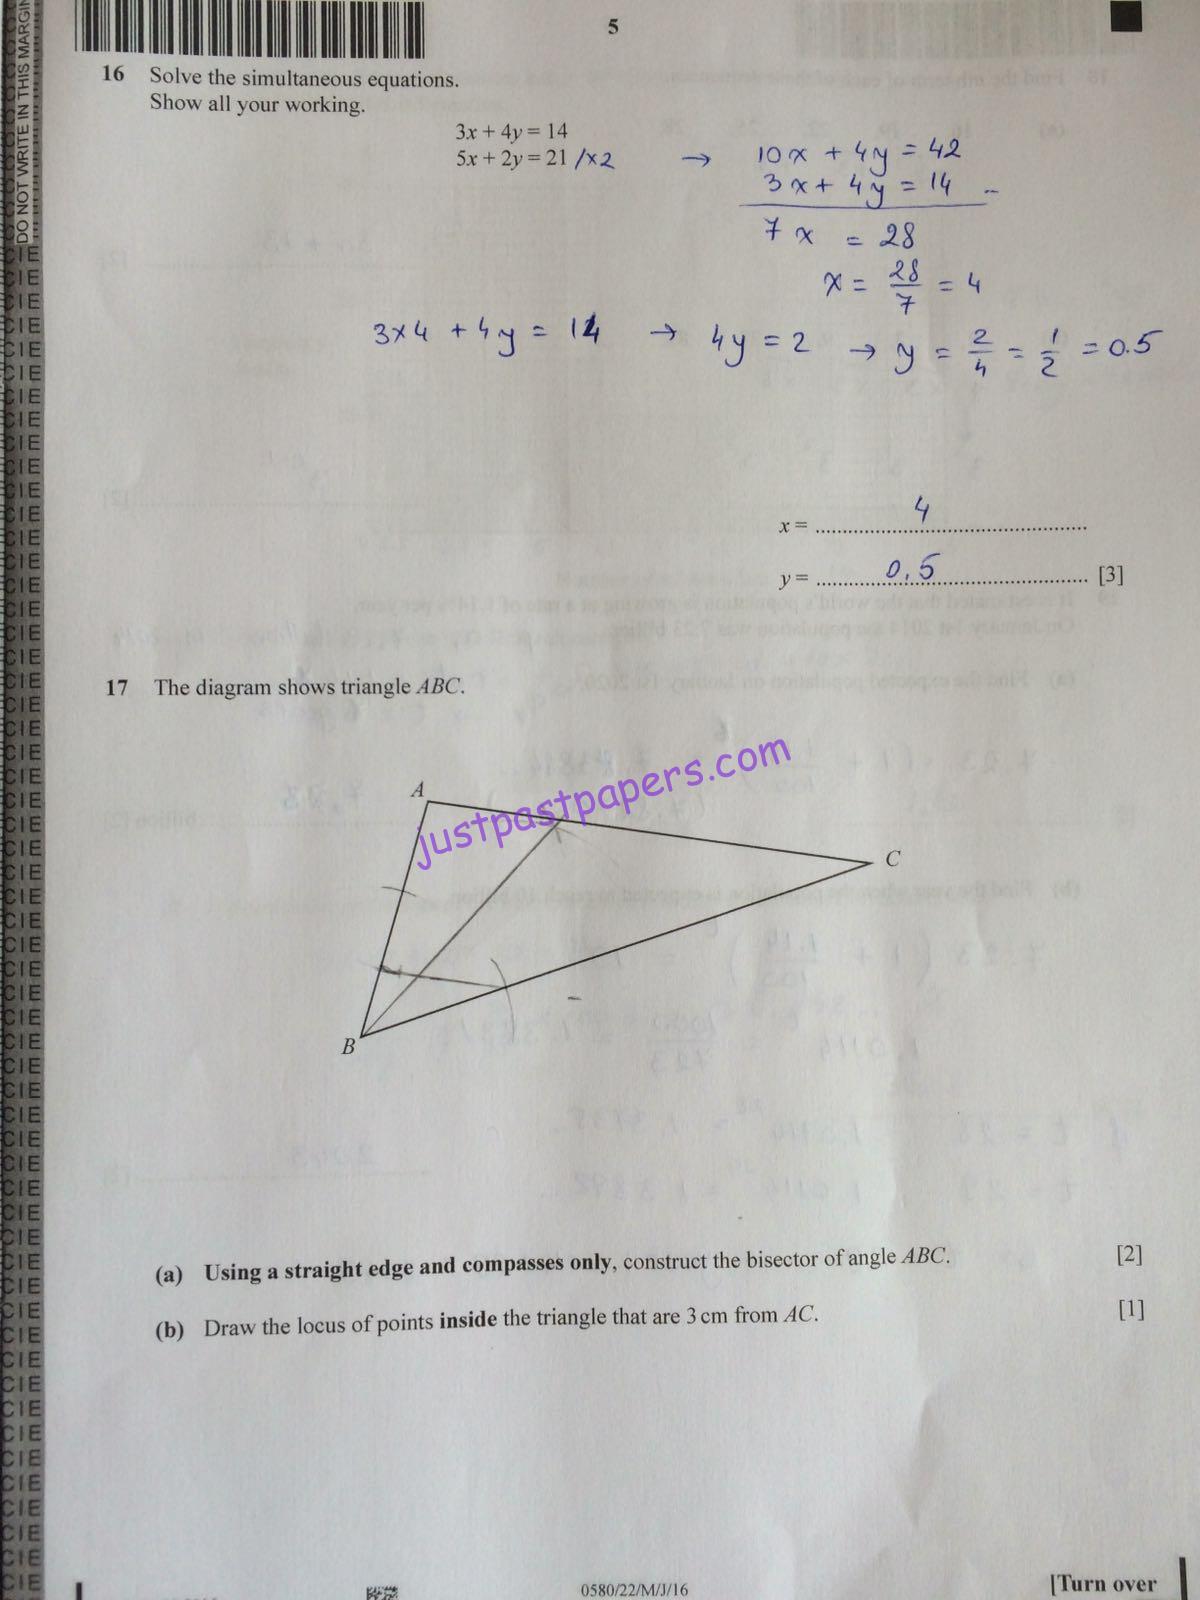 igcse mathematics past papers 2010